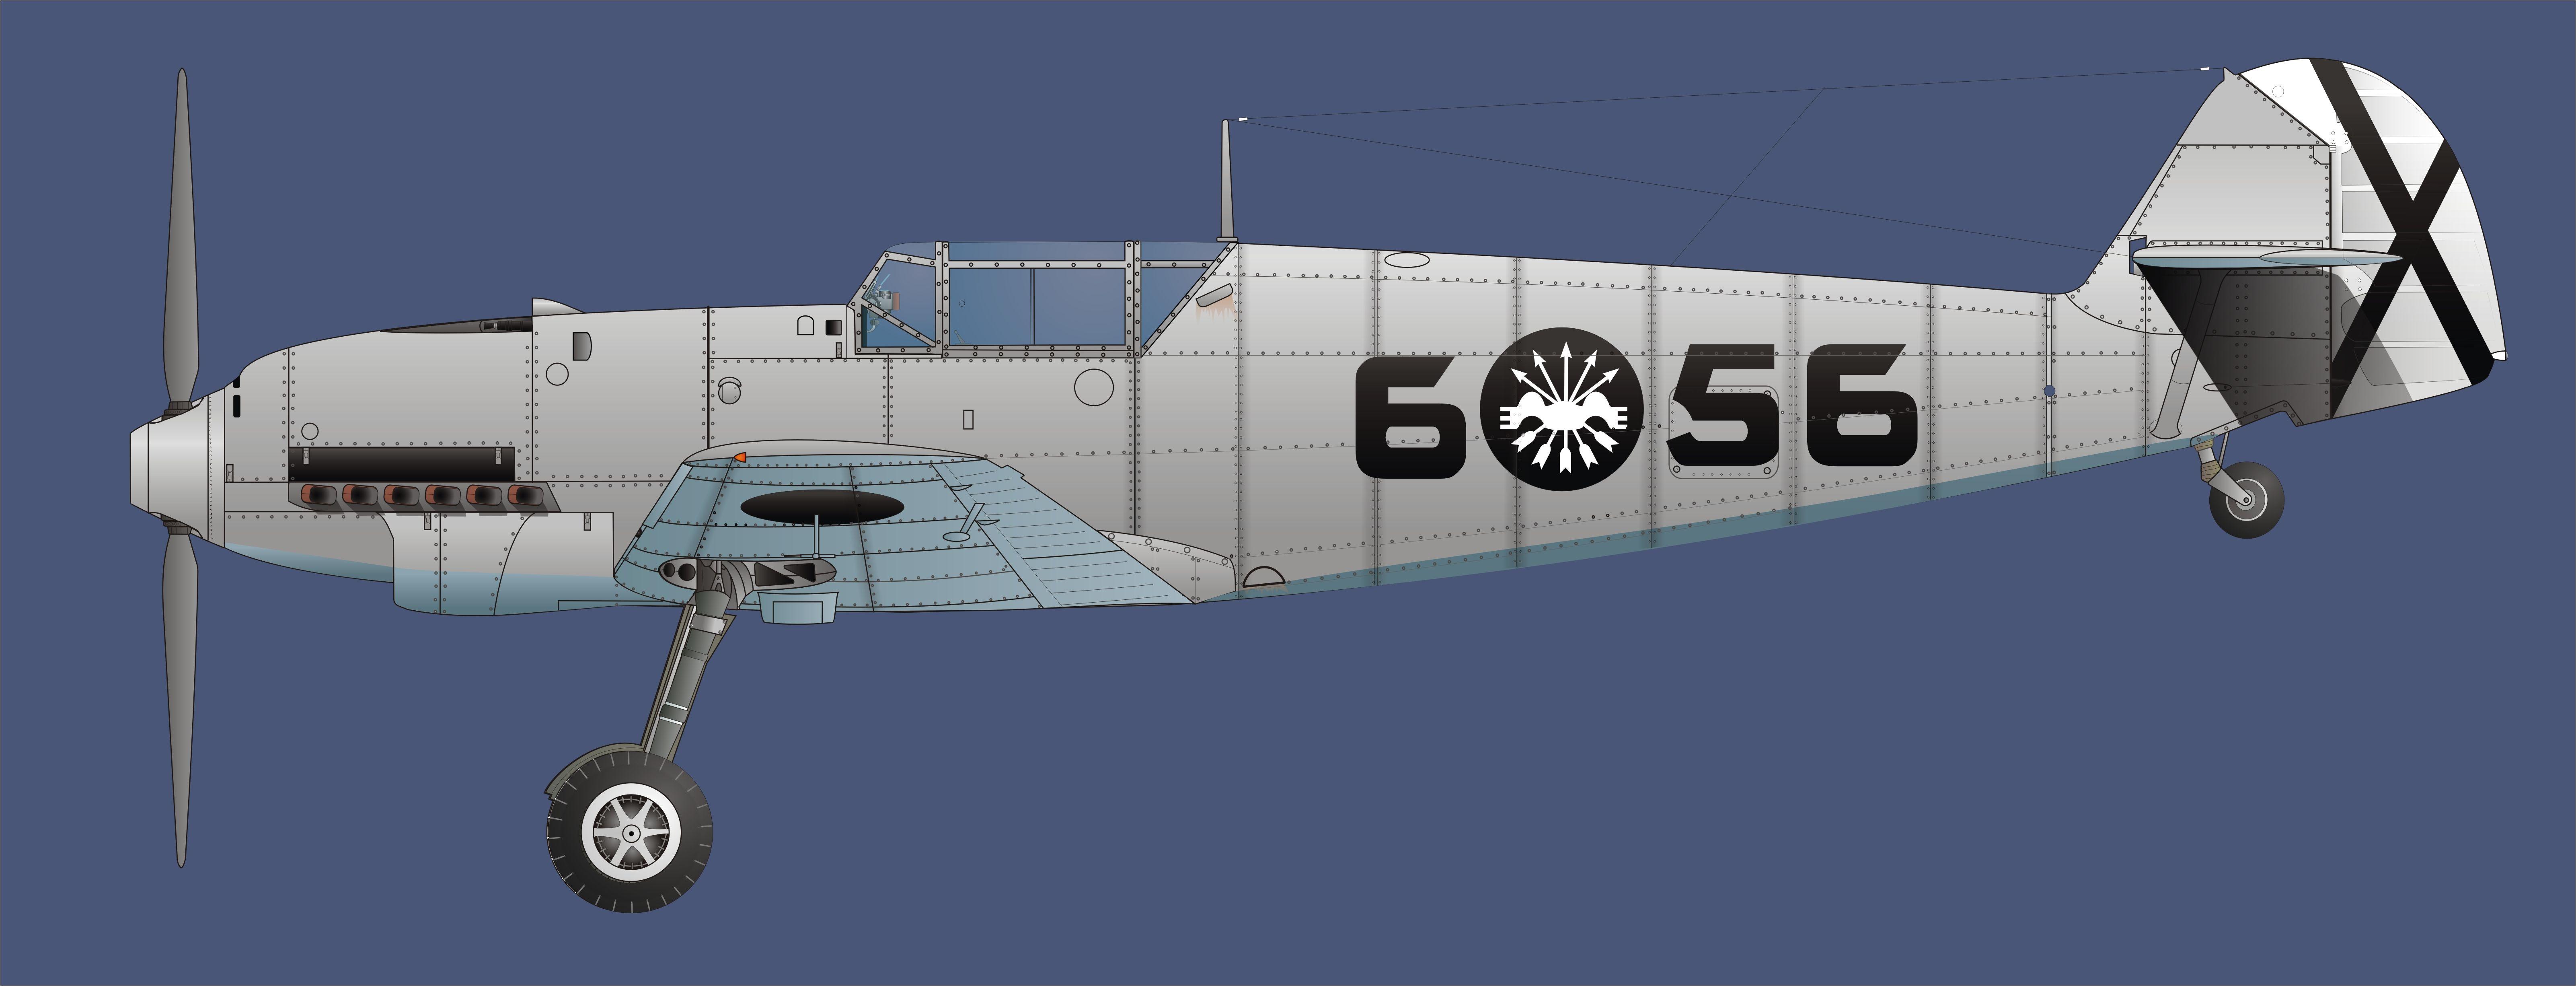 Aviacion de La legion Condor con emblema Falangista